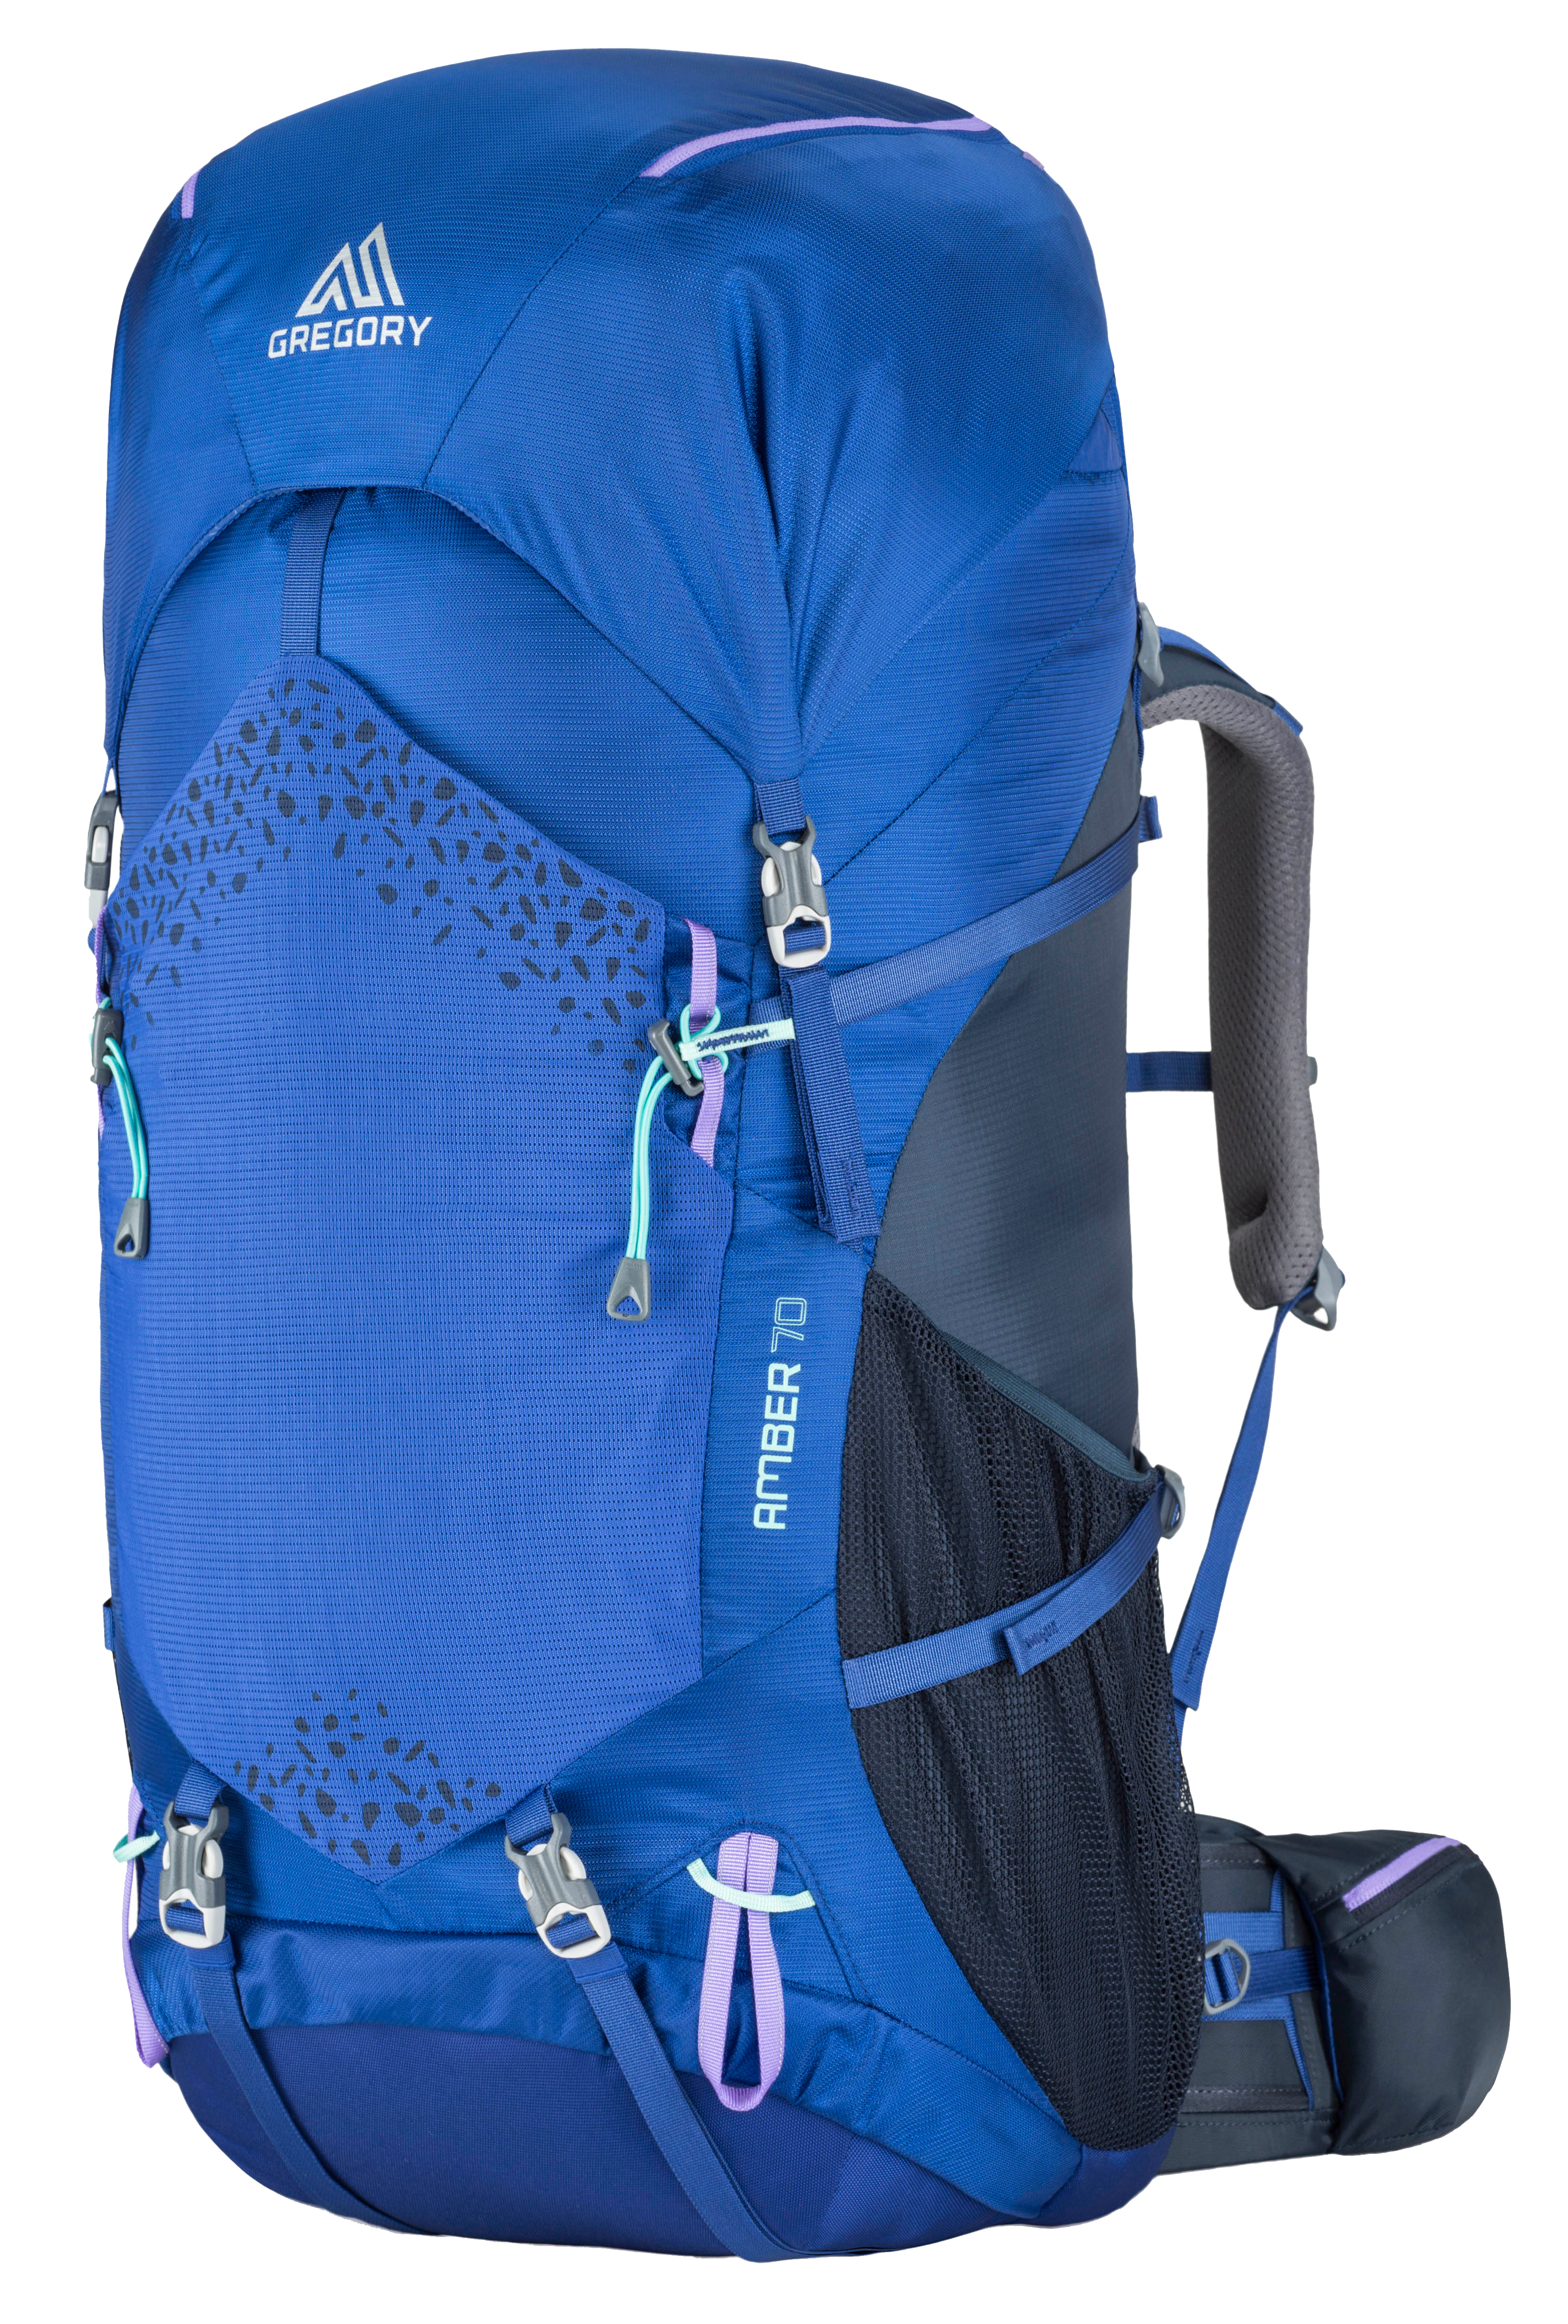 Gregory Amber 70 Backpack Womens Timbuk2 Q Pack Hijau